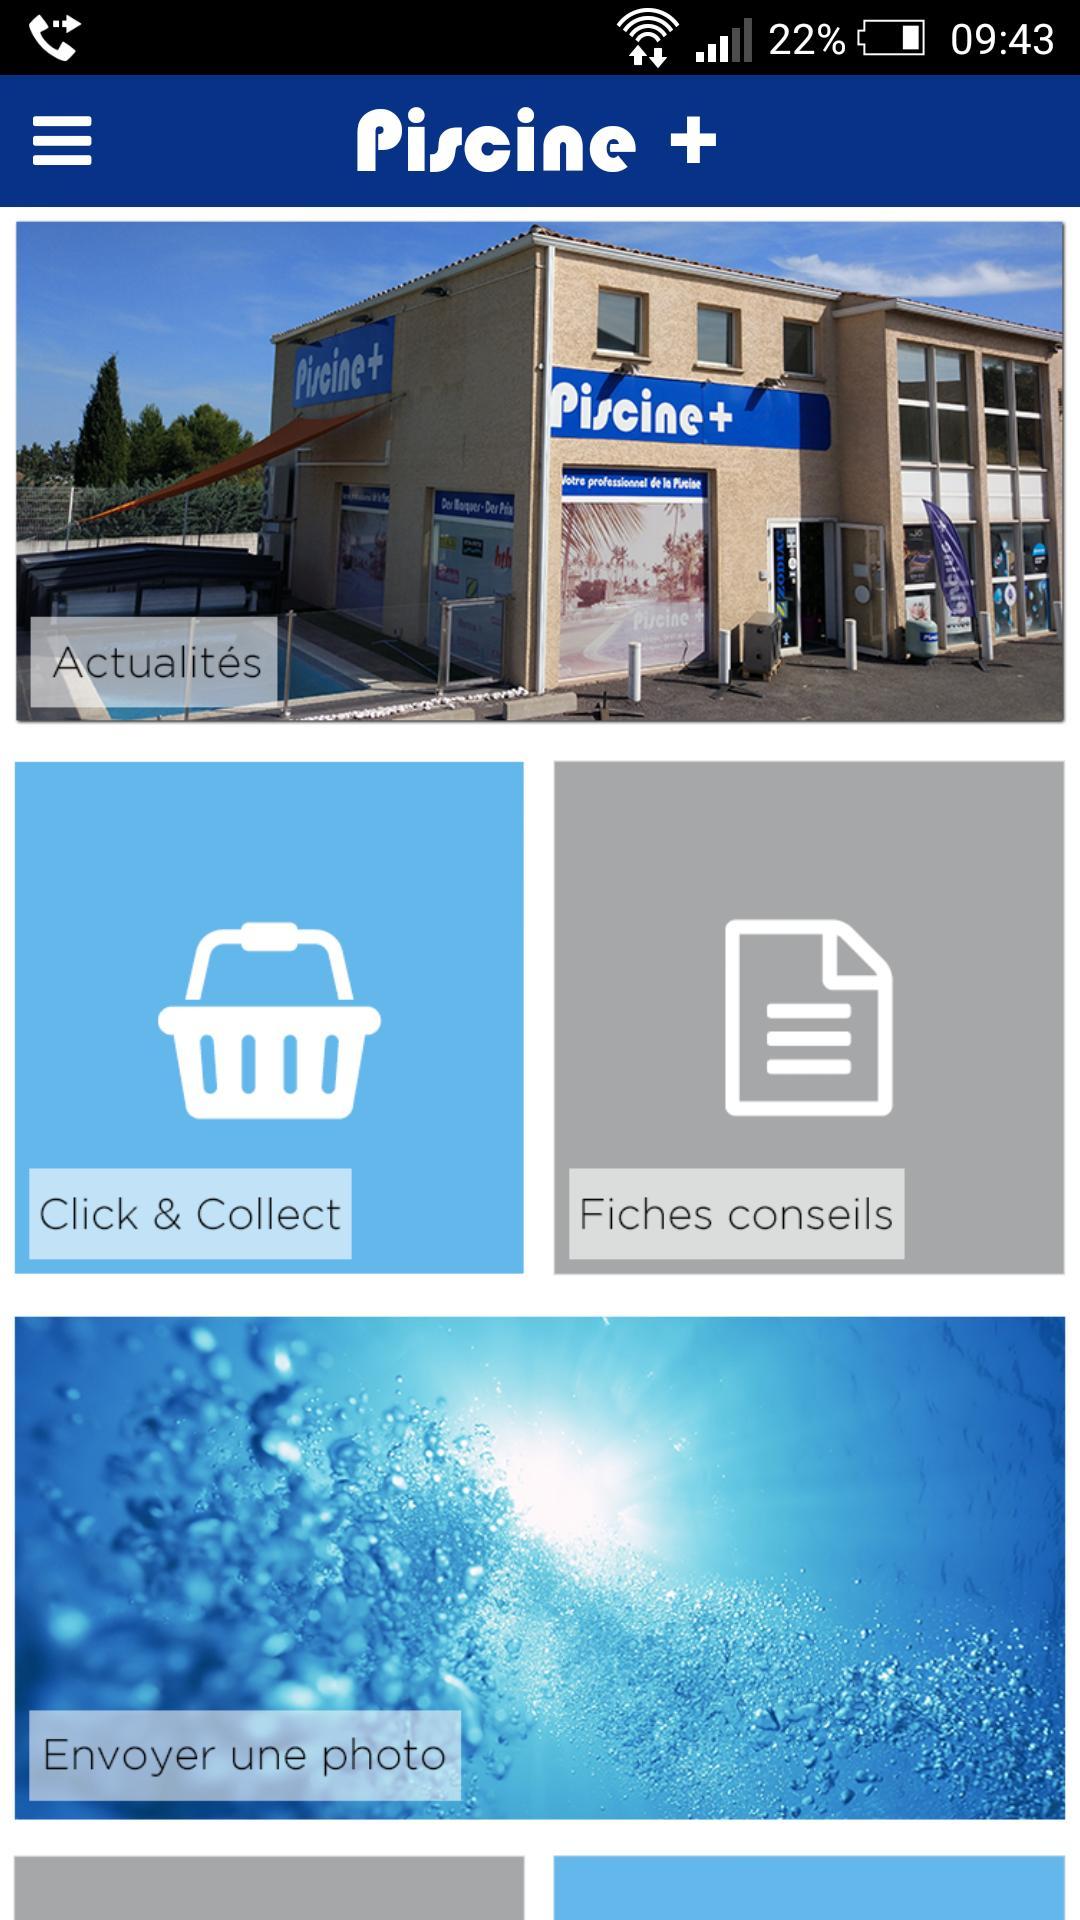 Piscine Plus For Android - Apk Download à Piscine Plus Le Cres